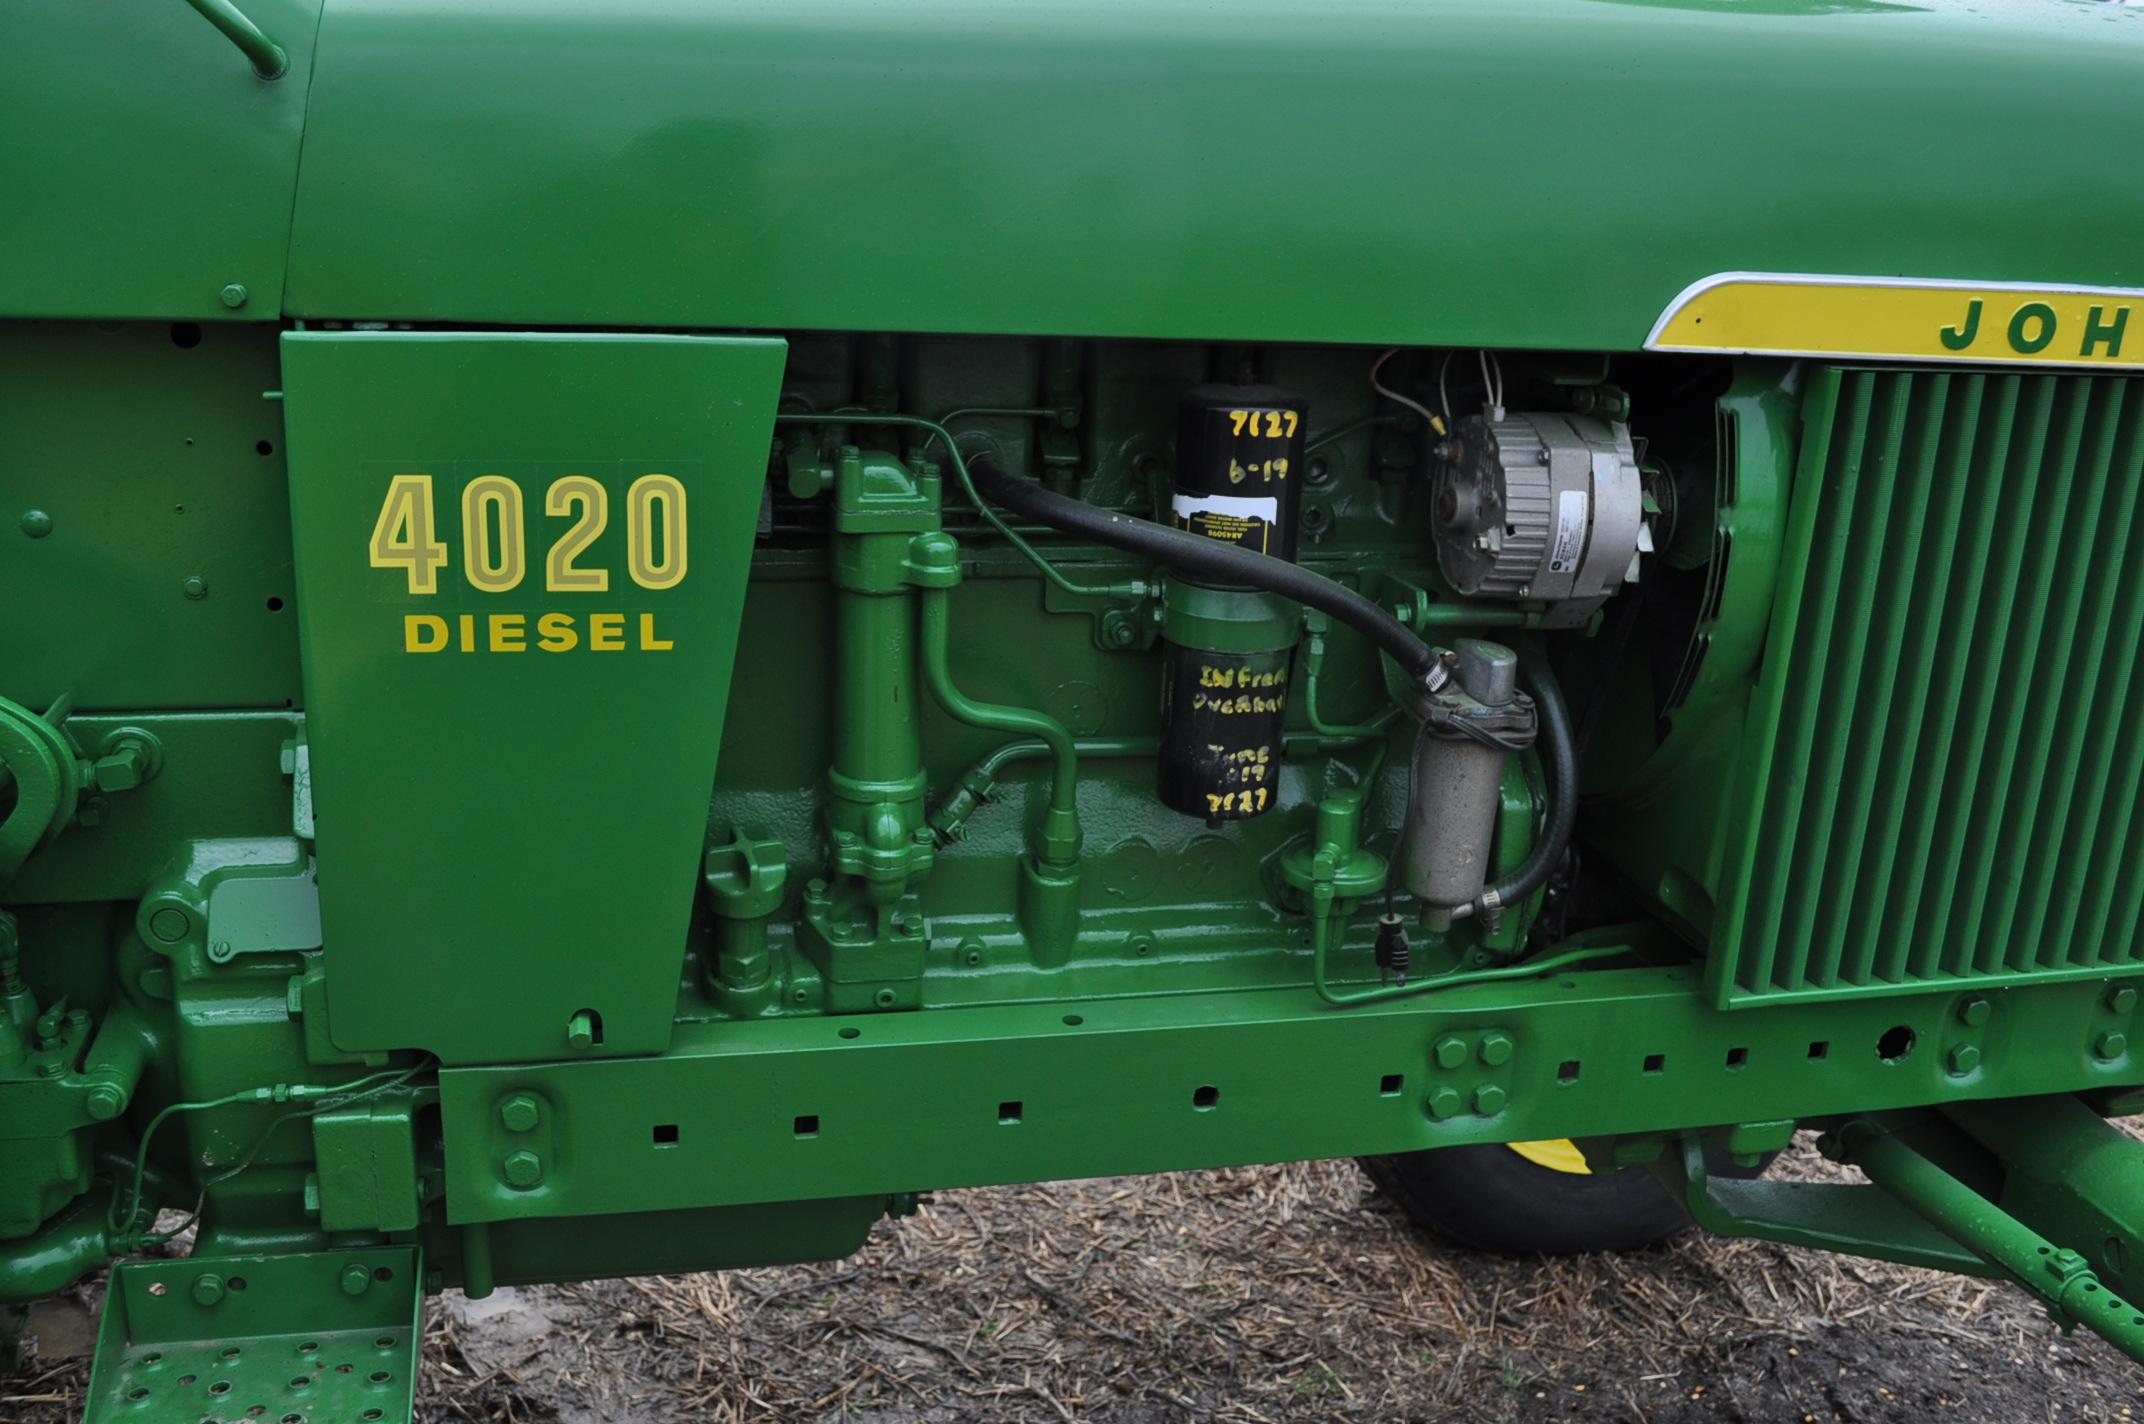 John Deere 4020 powershift, major overhaul on motor, 12V system, dual hyd remotes, wide front, 7,130 - Image 9 of 18